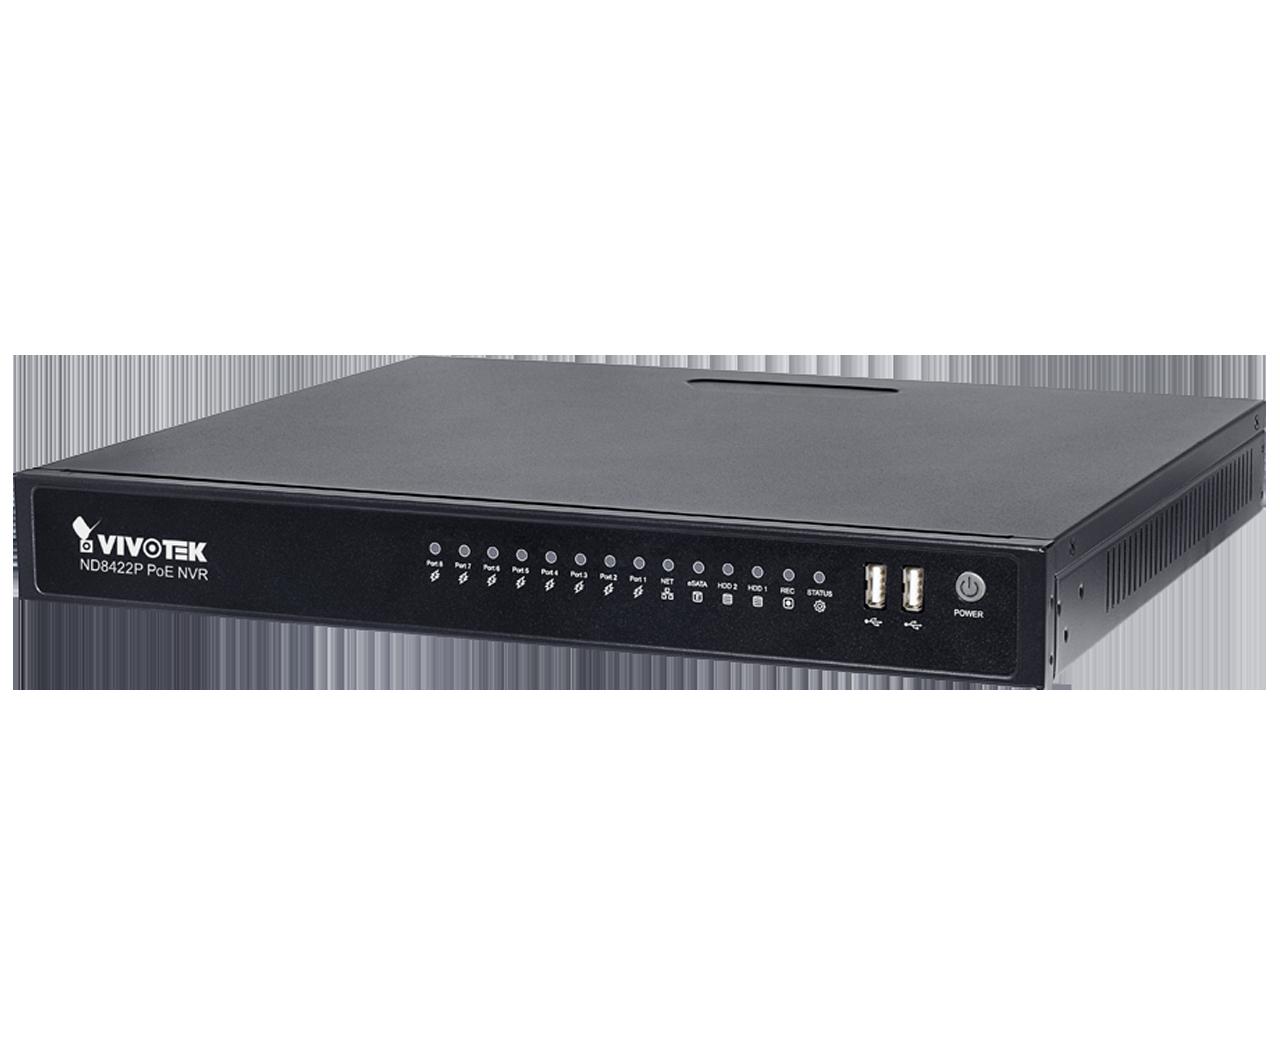 ND8422P 16-CH Embedded PoE NVR